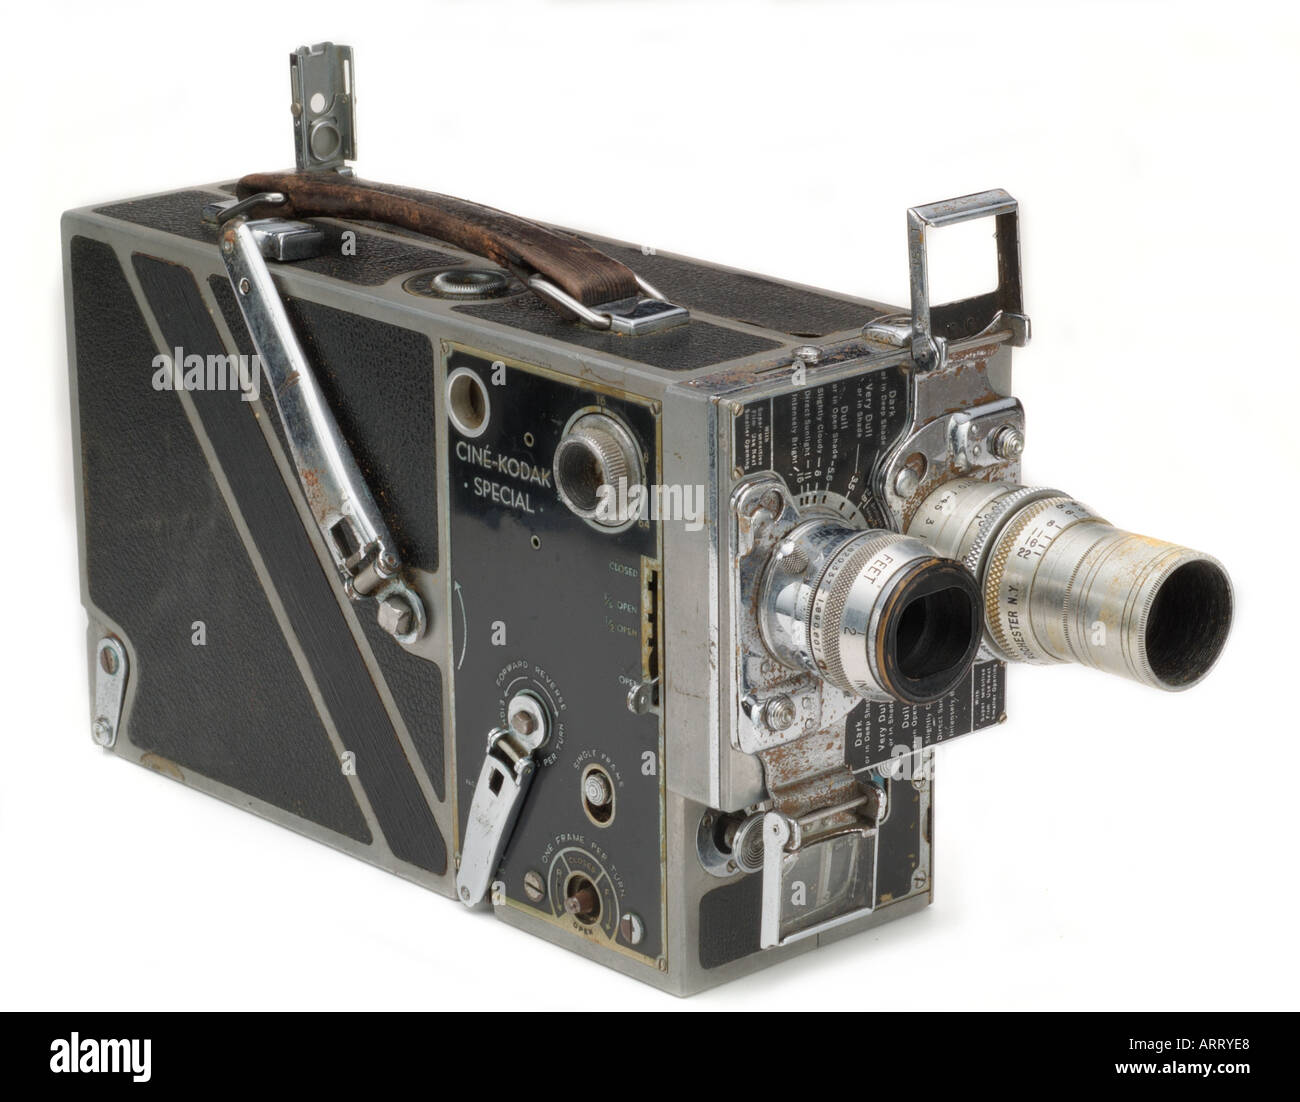 Kodak special Vintage 16mm cine film camera England UK